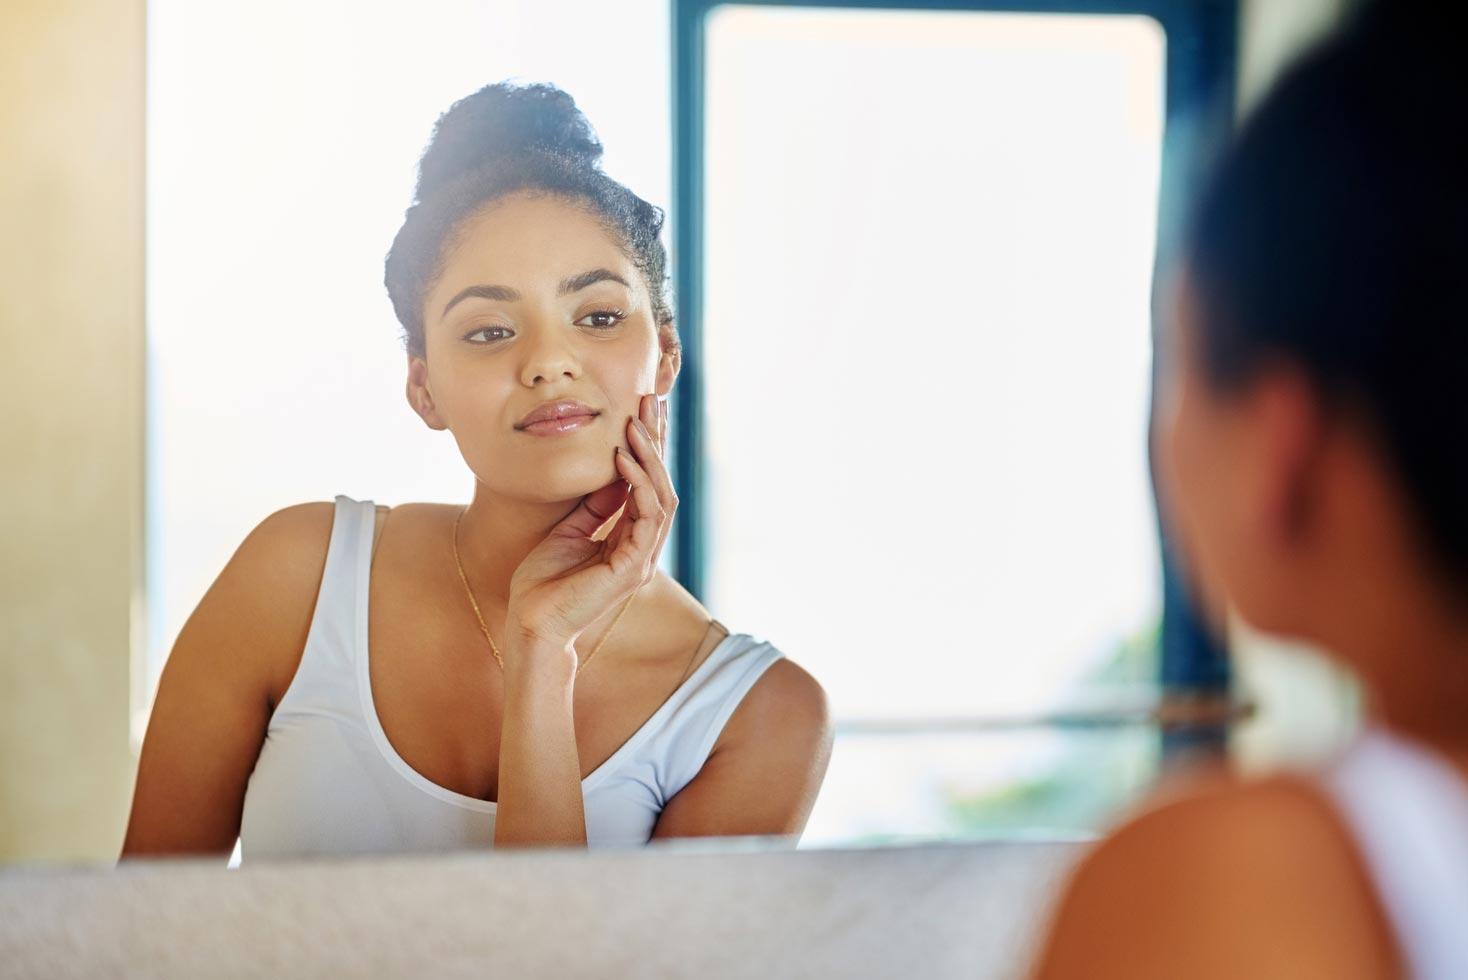 Does Fresh Skin Care Test Animals